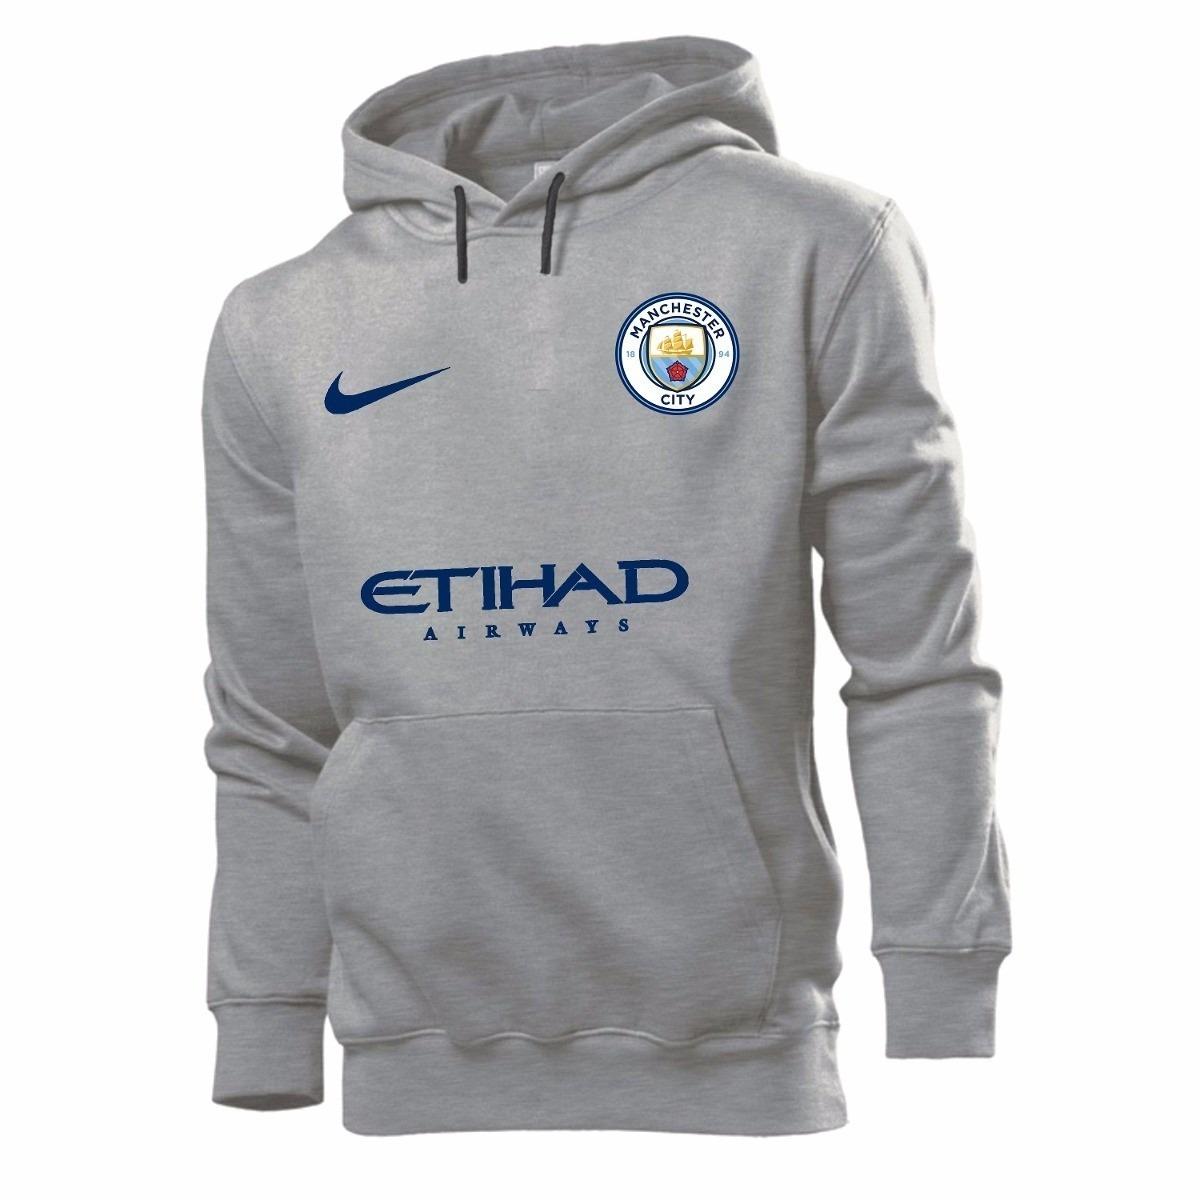 Kit 2 Blusas Moletom Chelsea + Manchester City 2018 Moleton - R  139 ... 502edb3d0a5da